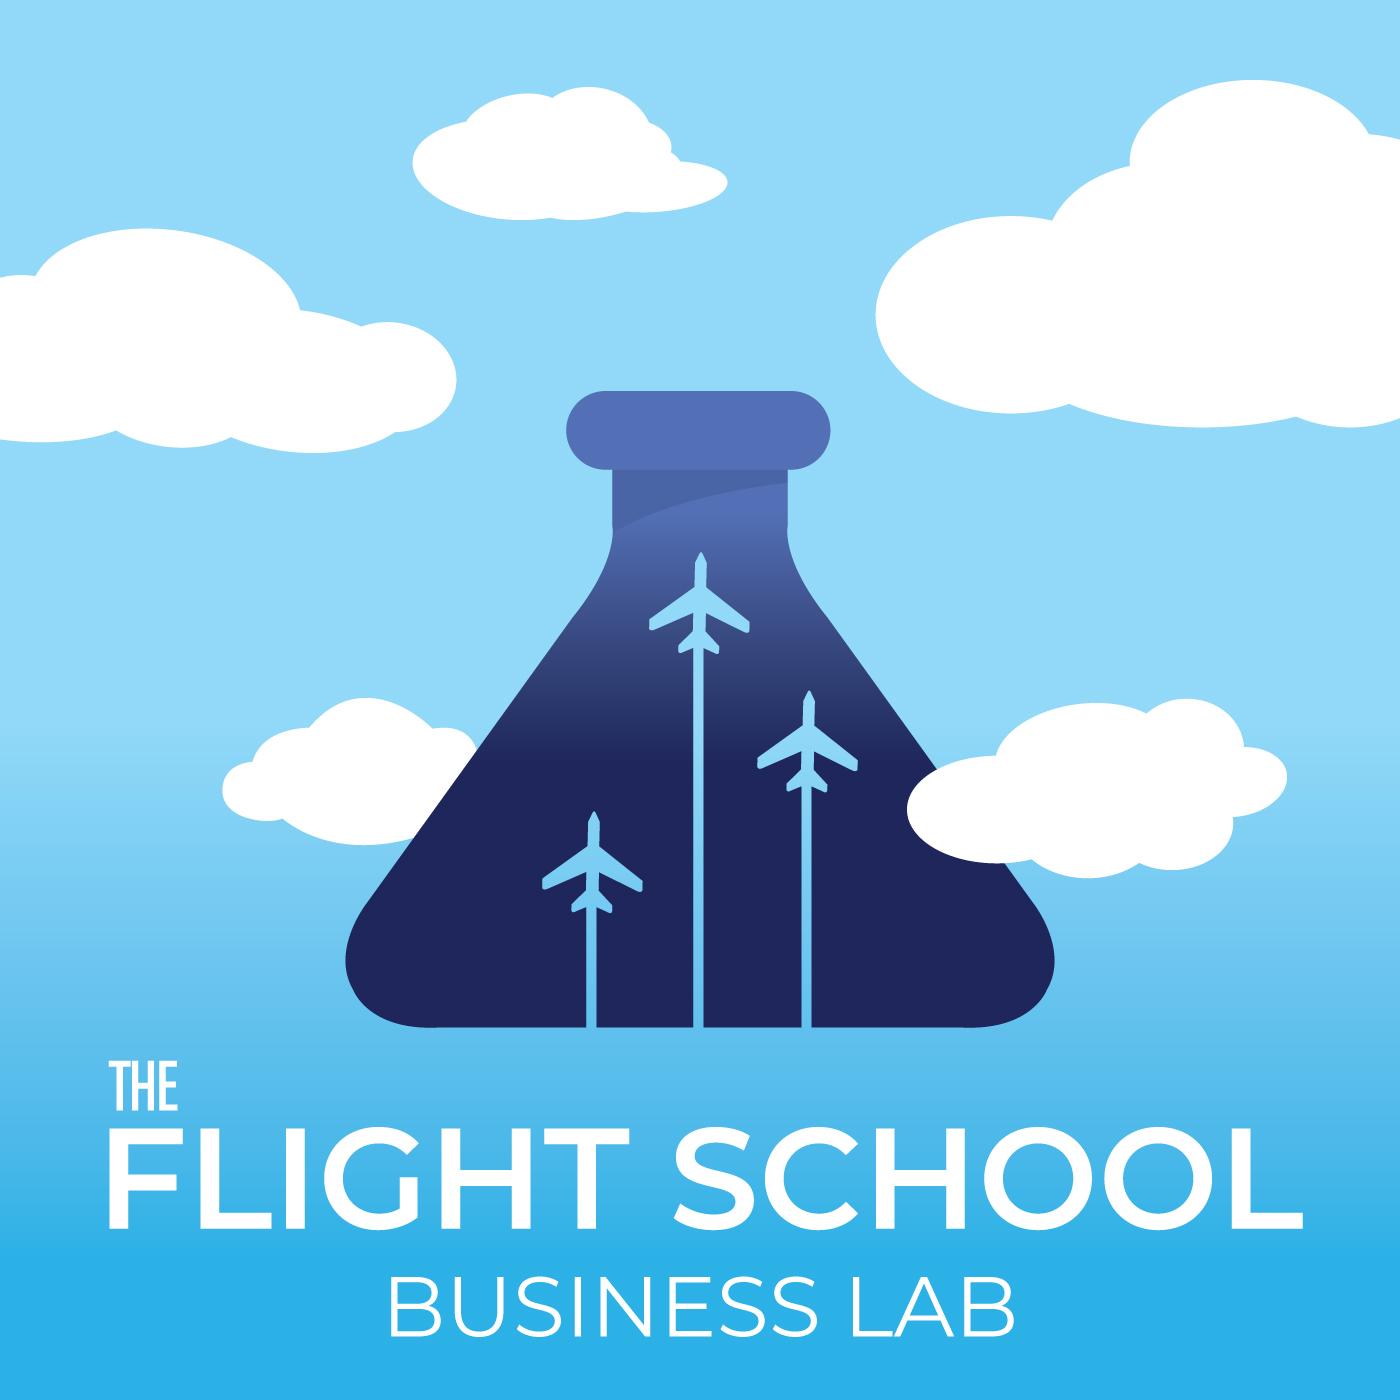 The Flight School Business Lab show image